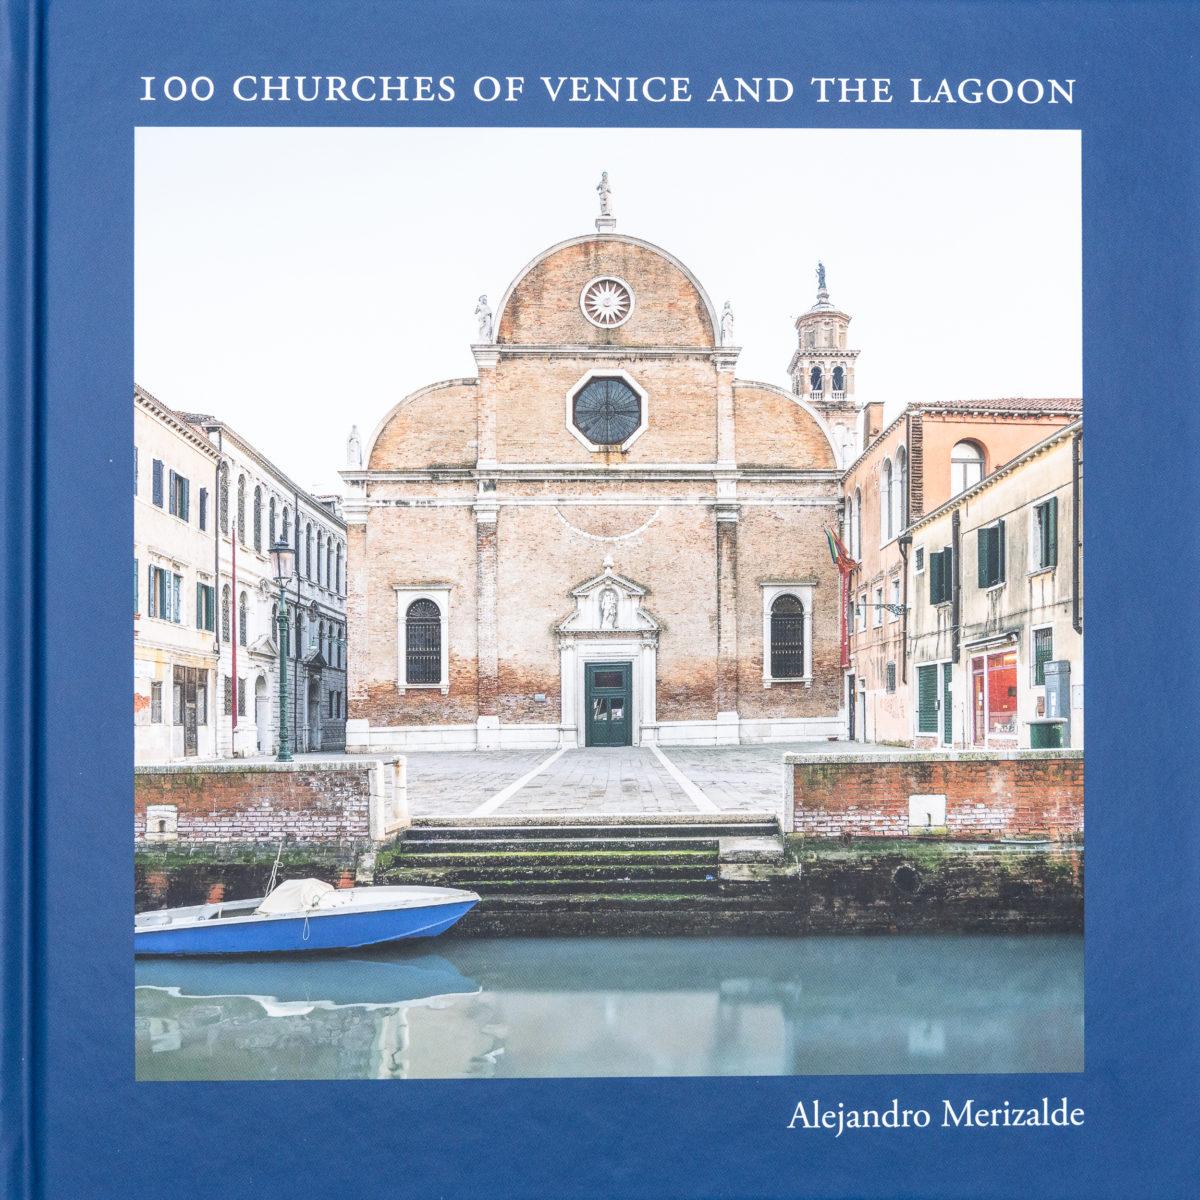 Alejandro Merizalde, 100 churches of Venice and the Lagoon